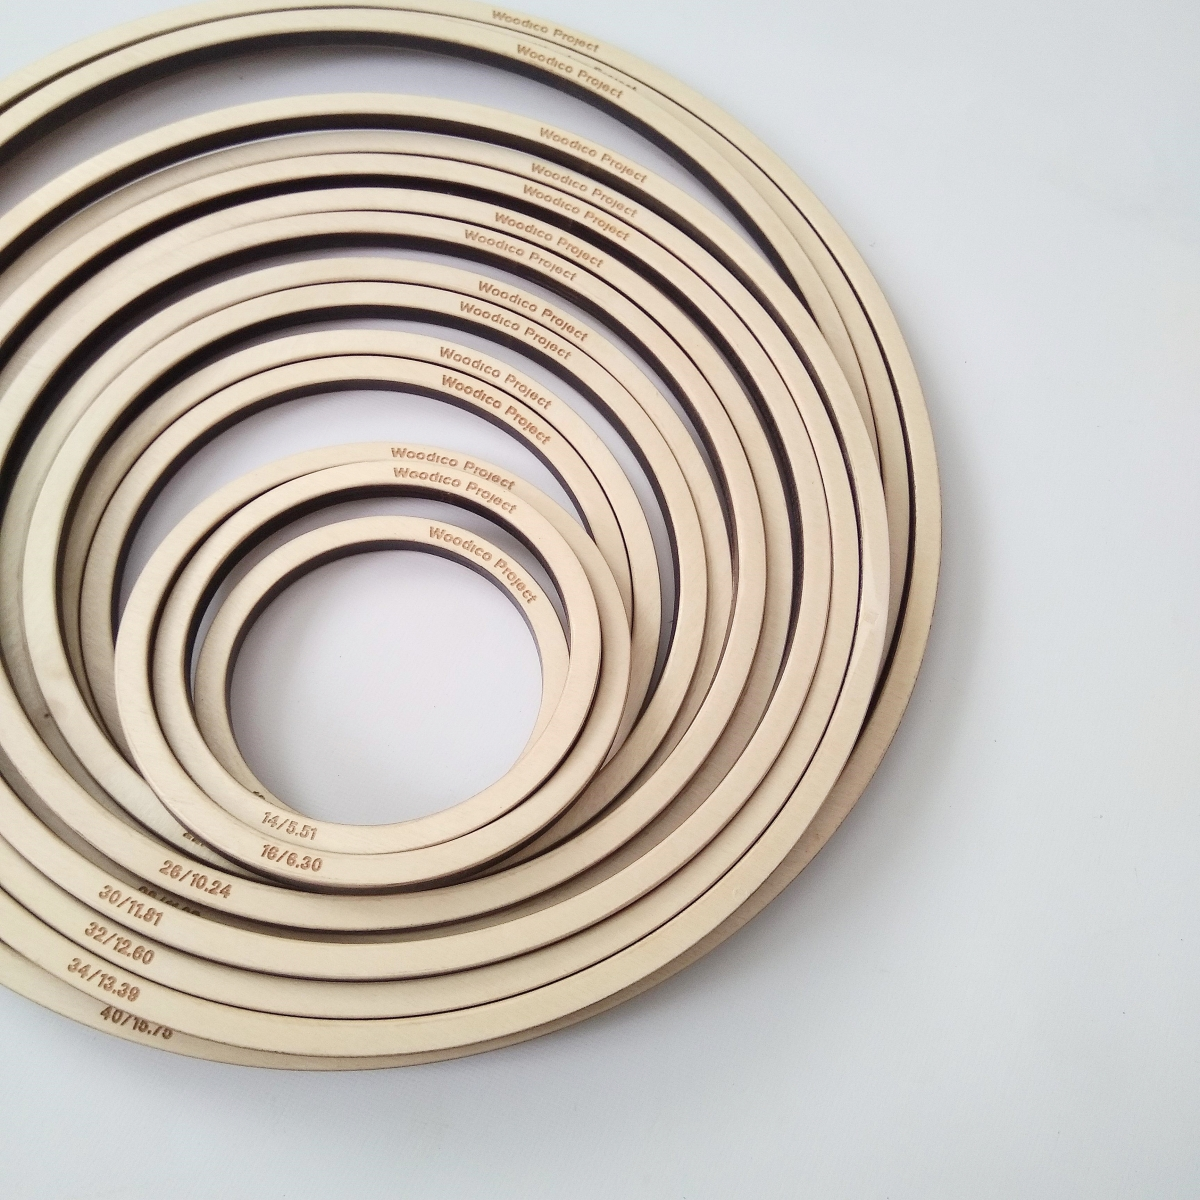 woodico.pro dream catcher base set of 15 rings 12 40 cm 13 1200x1200 - Dream catcher base / Set of 15 rings 12-40 cm